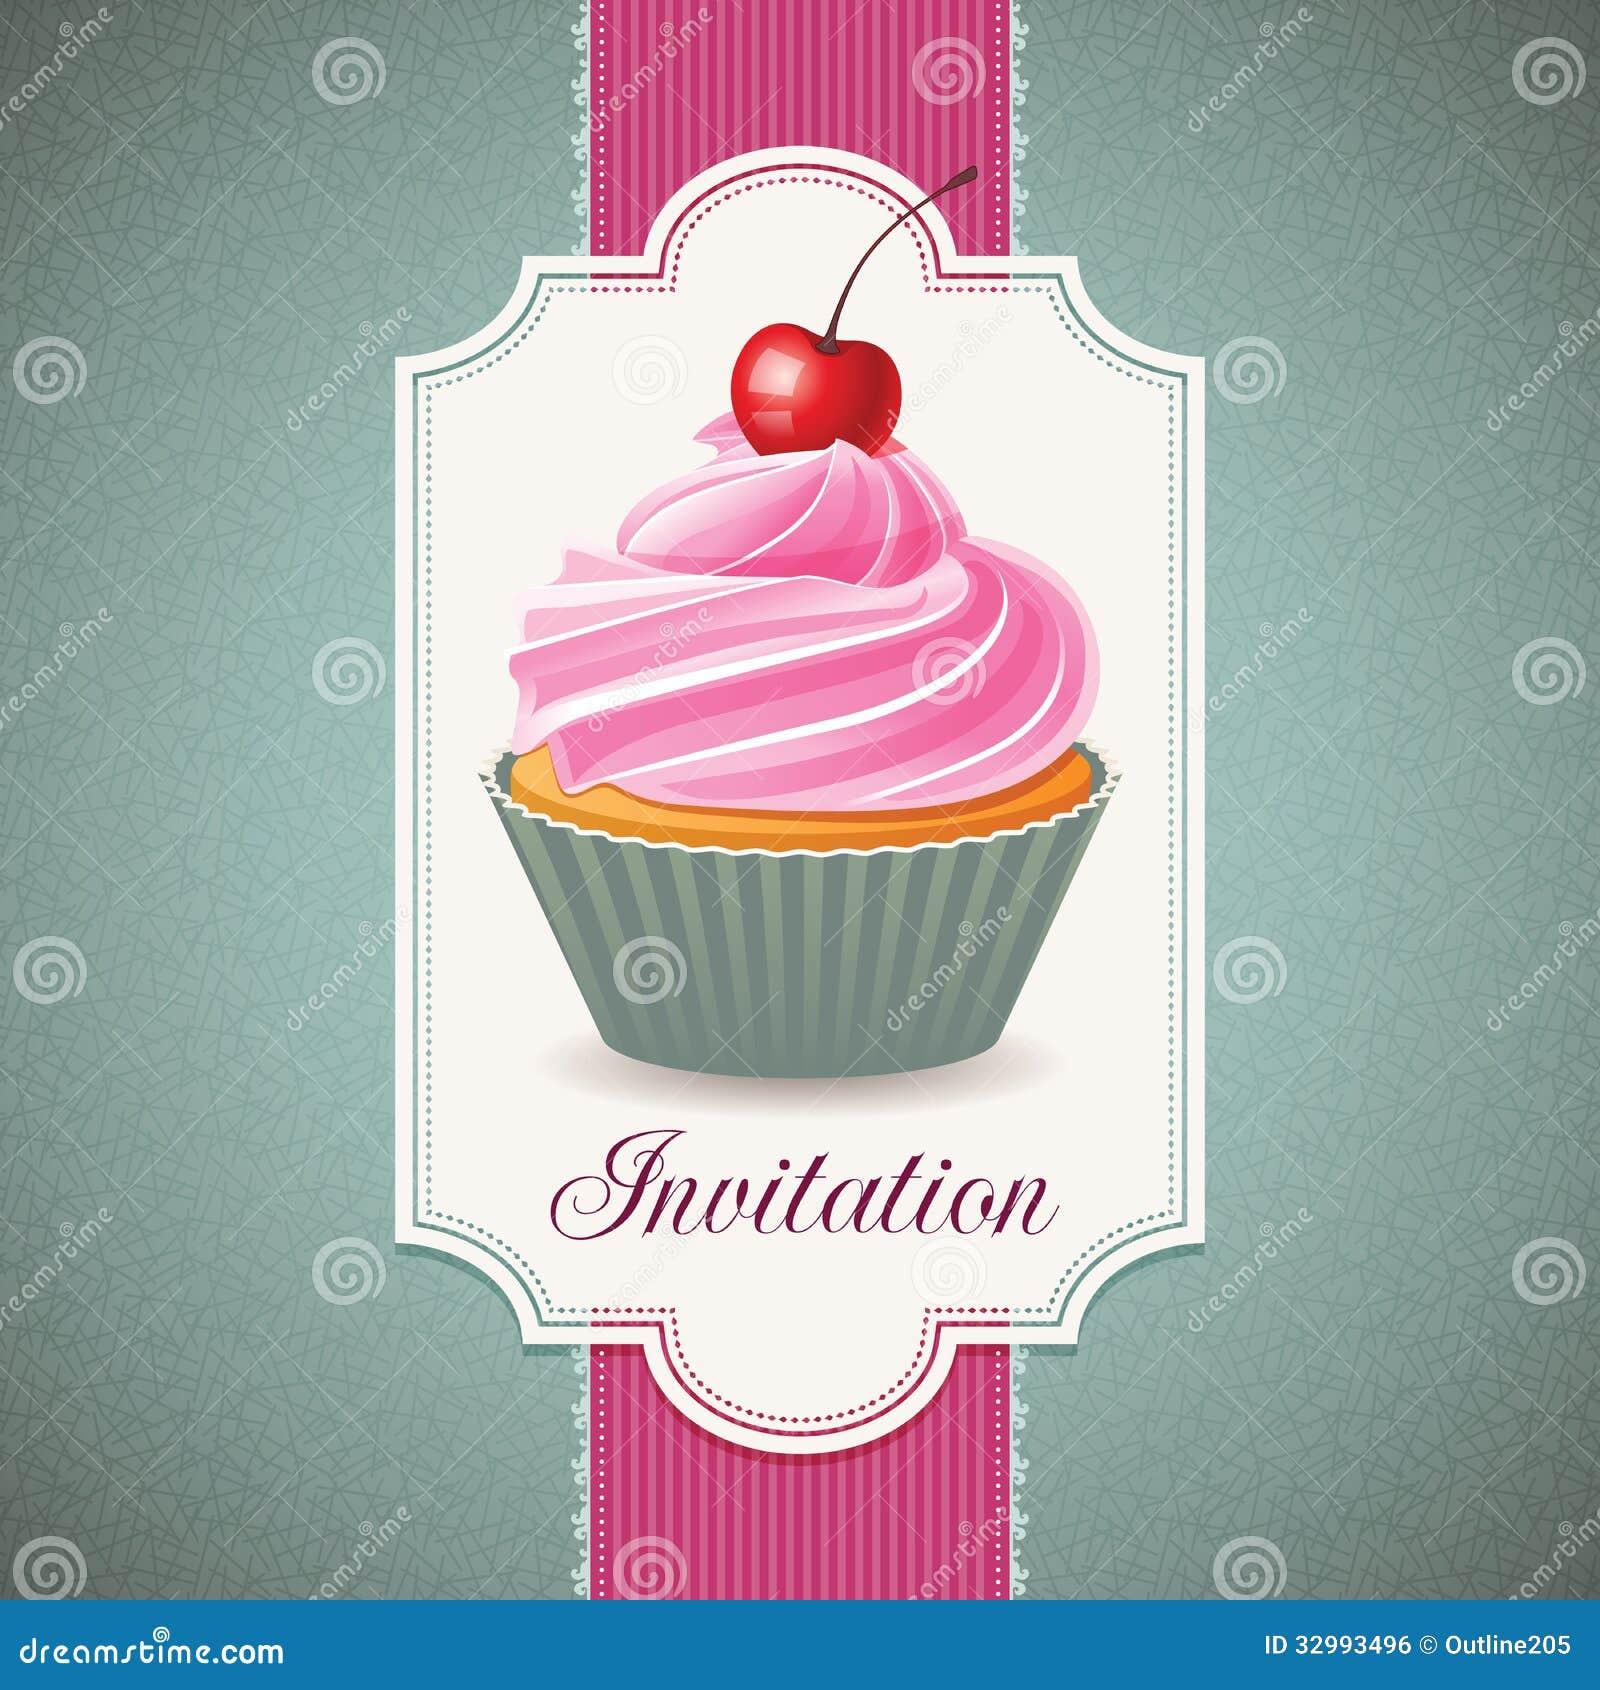 Cupcake Art Design : Vintage Card With Cupcake Royalty Free Stock Image - Image ...